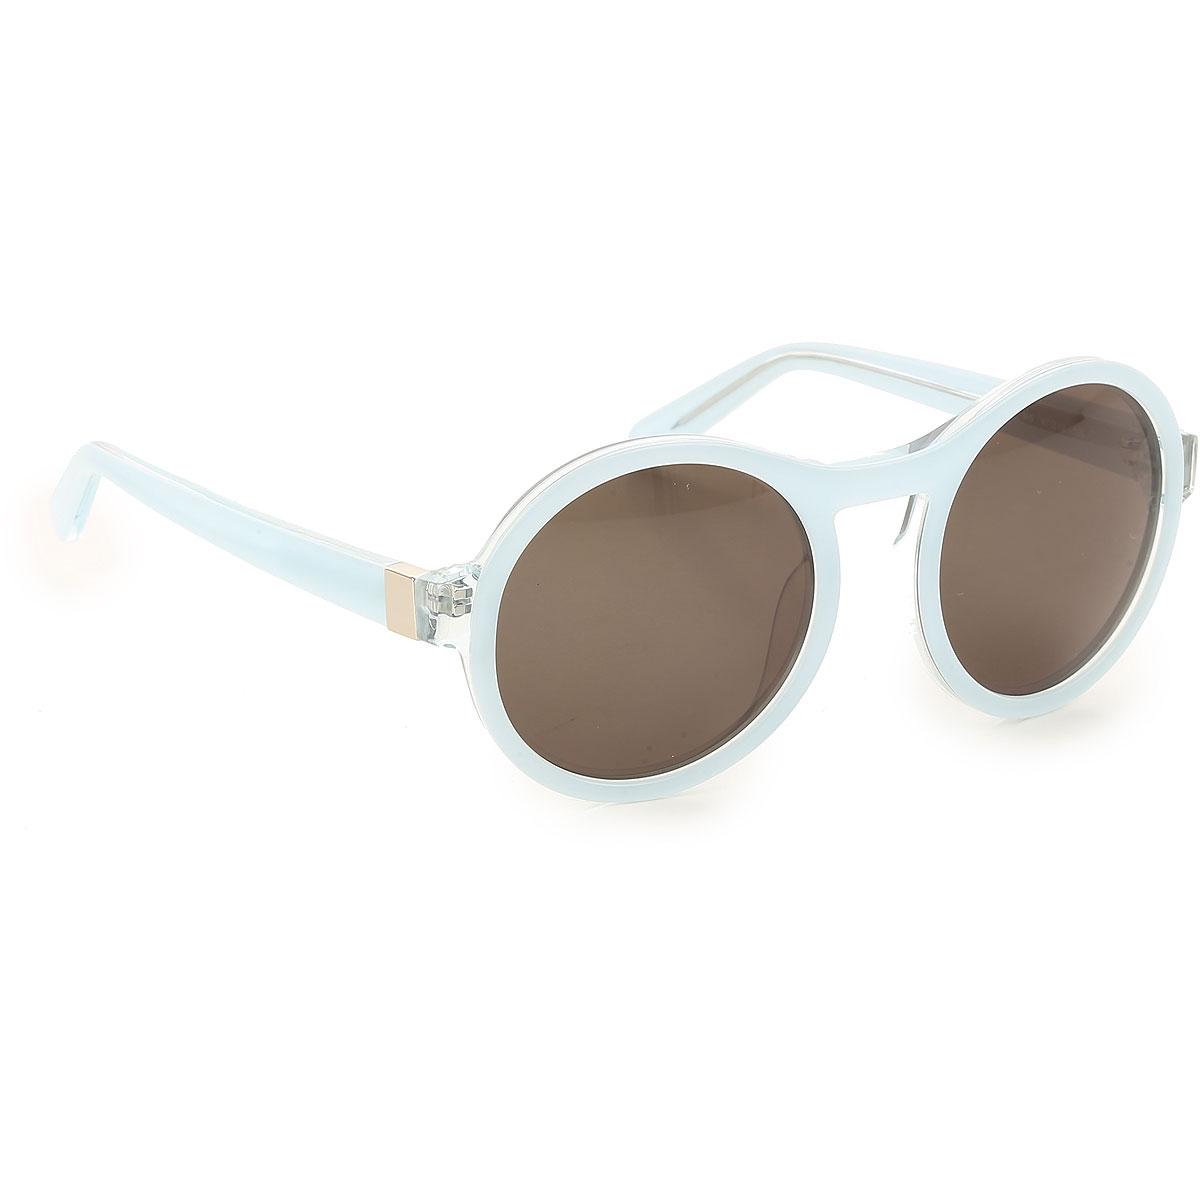 Image of Chloe Kids Sunglasses for Girls On Sale, Azure, 2017